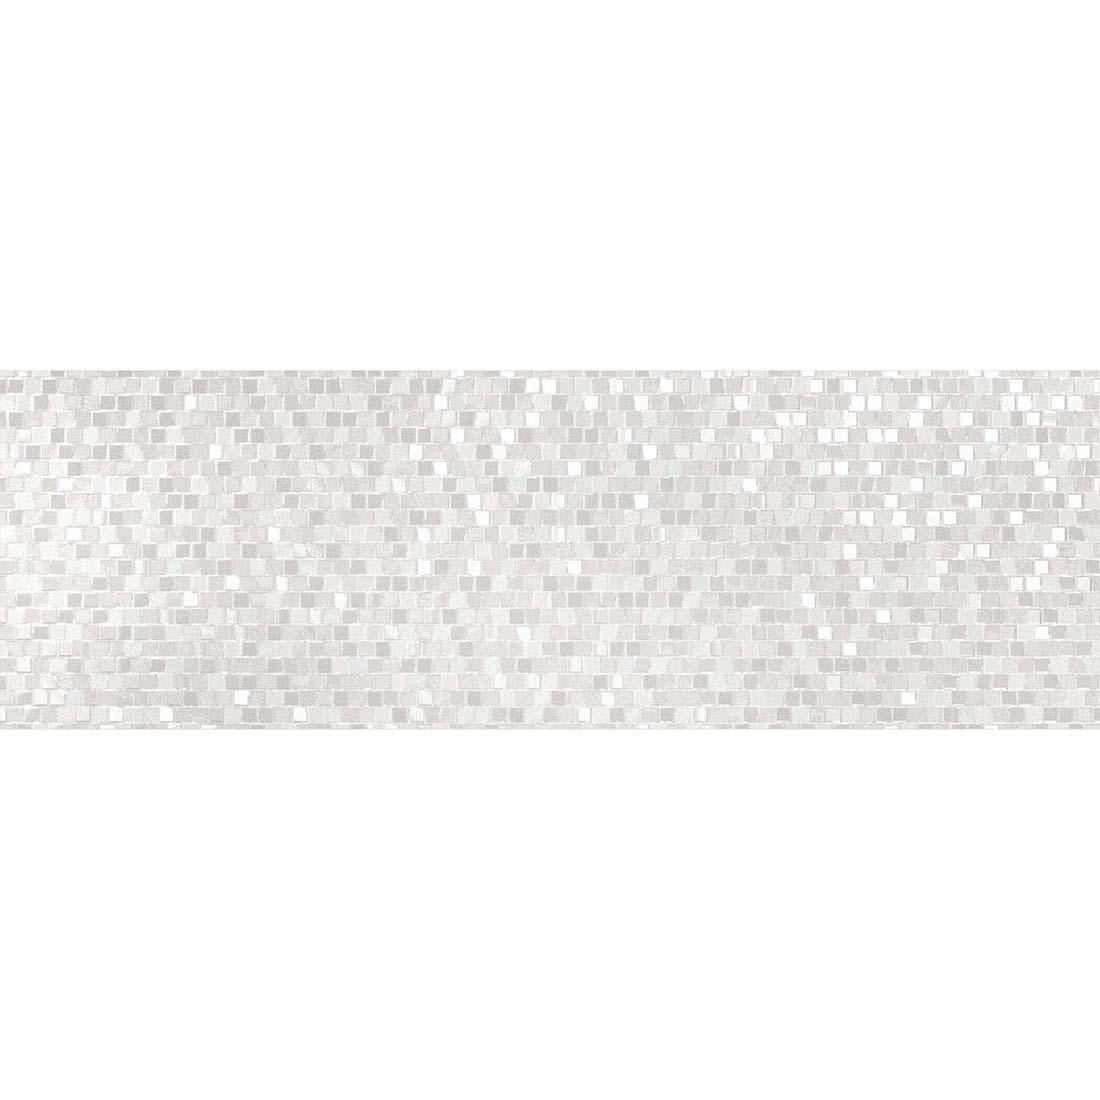 Hit Mos Decor 25x75 Blanco Gloss